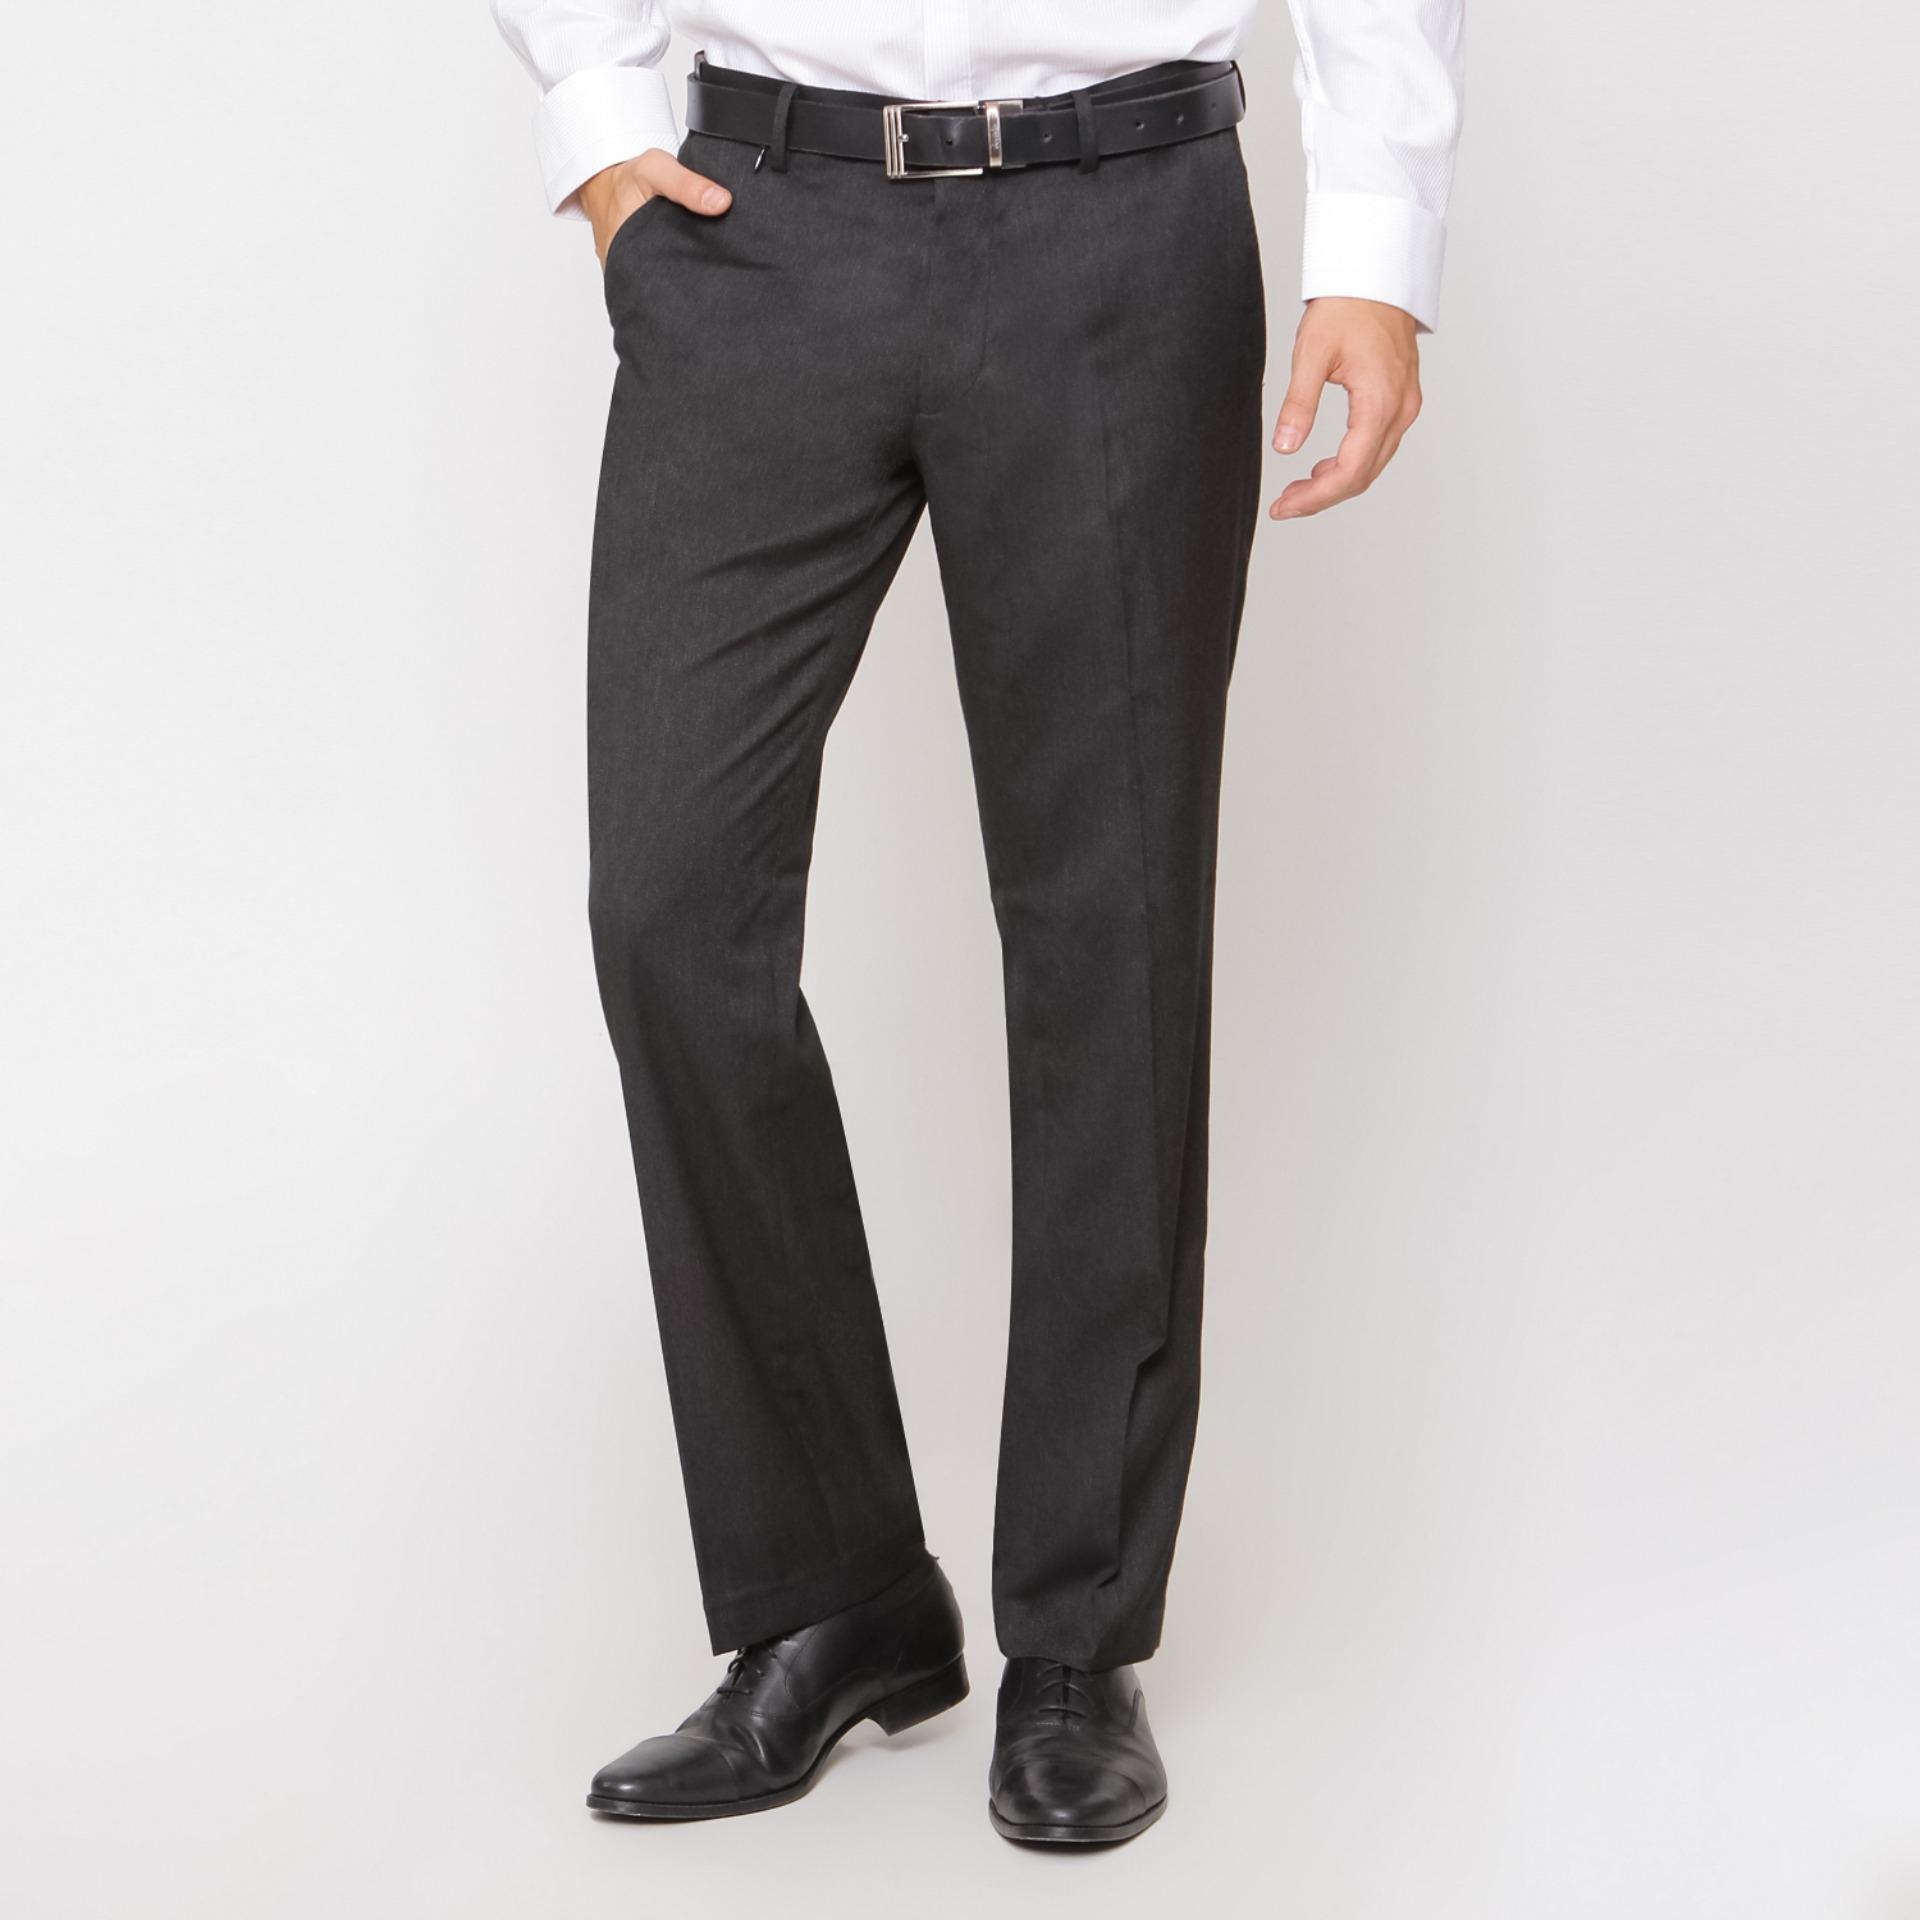 Review Jobb Madison S Dark Black Pants Jobb Di Indonesia